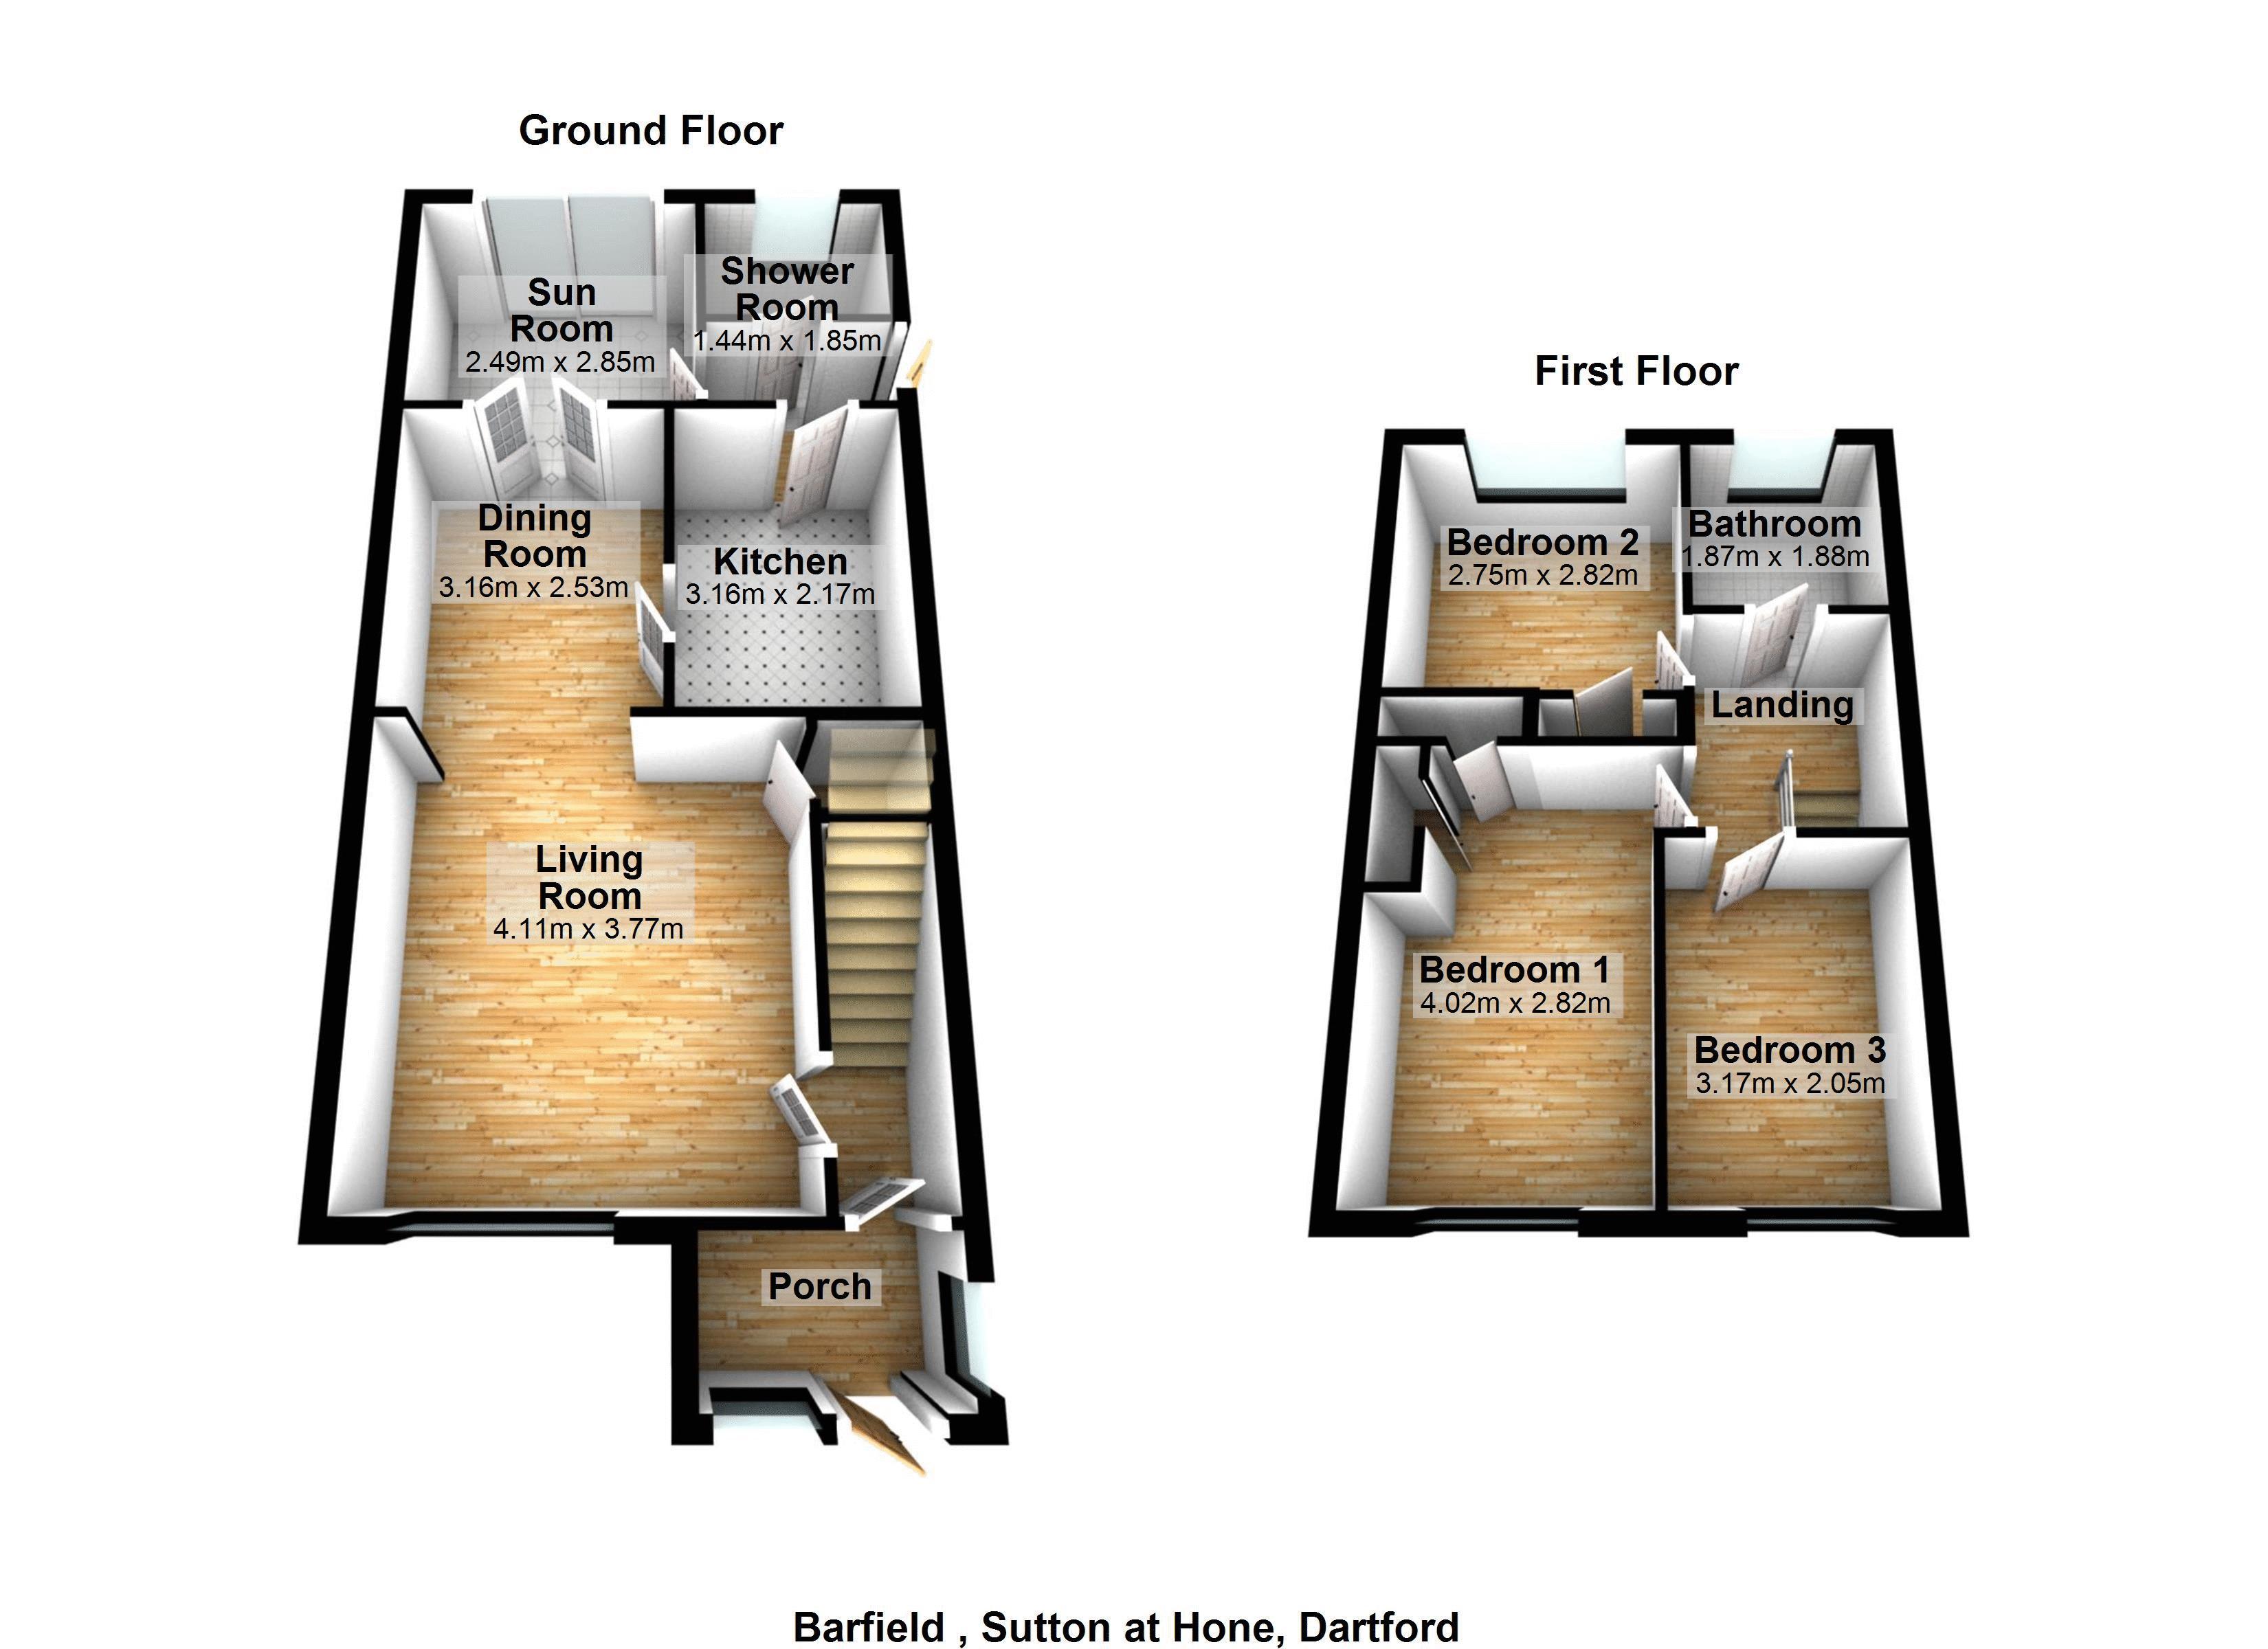 floorplan 59 Barfield